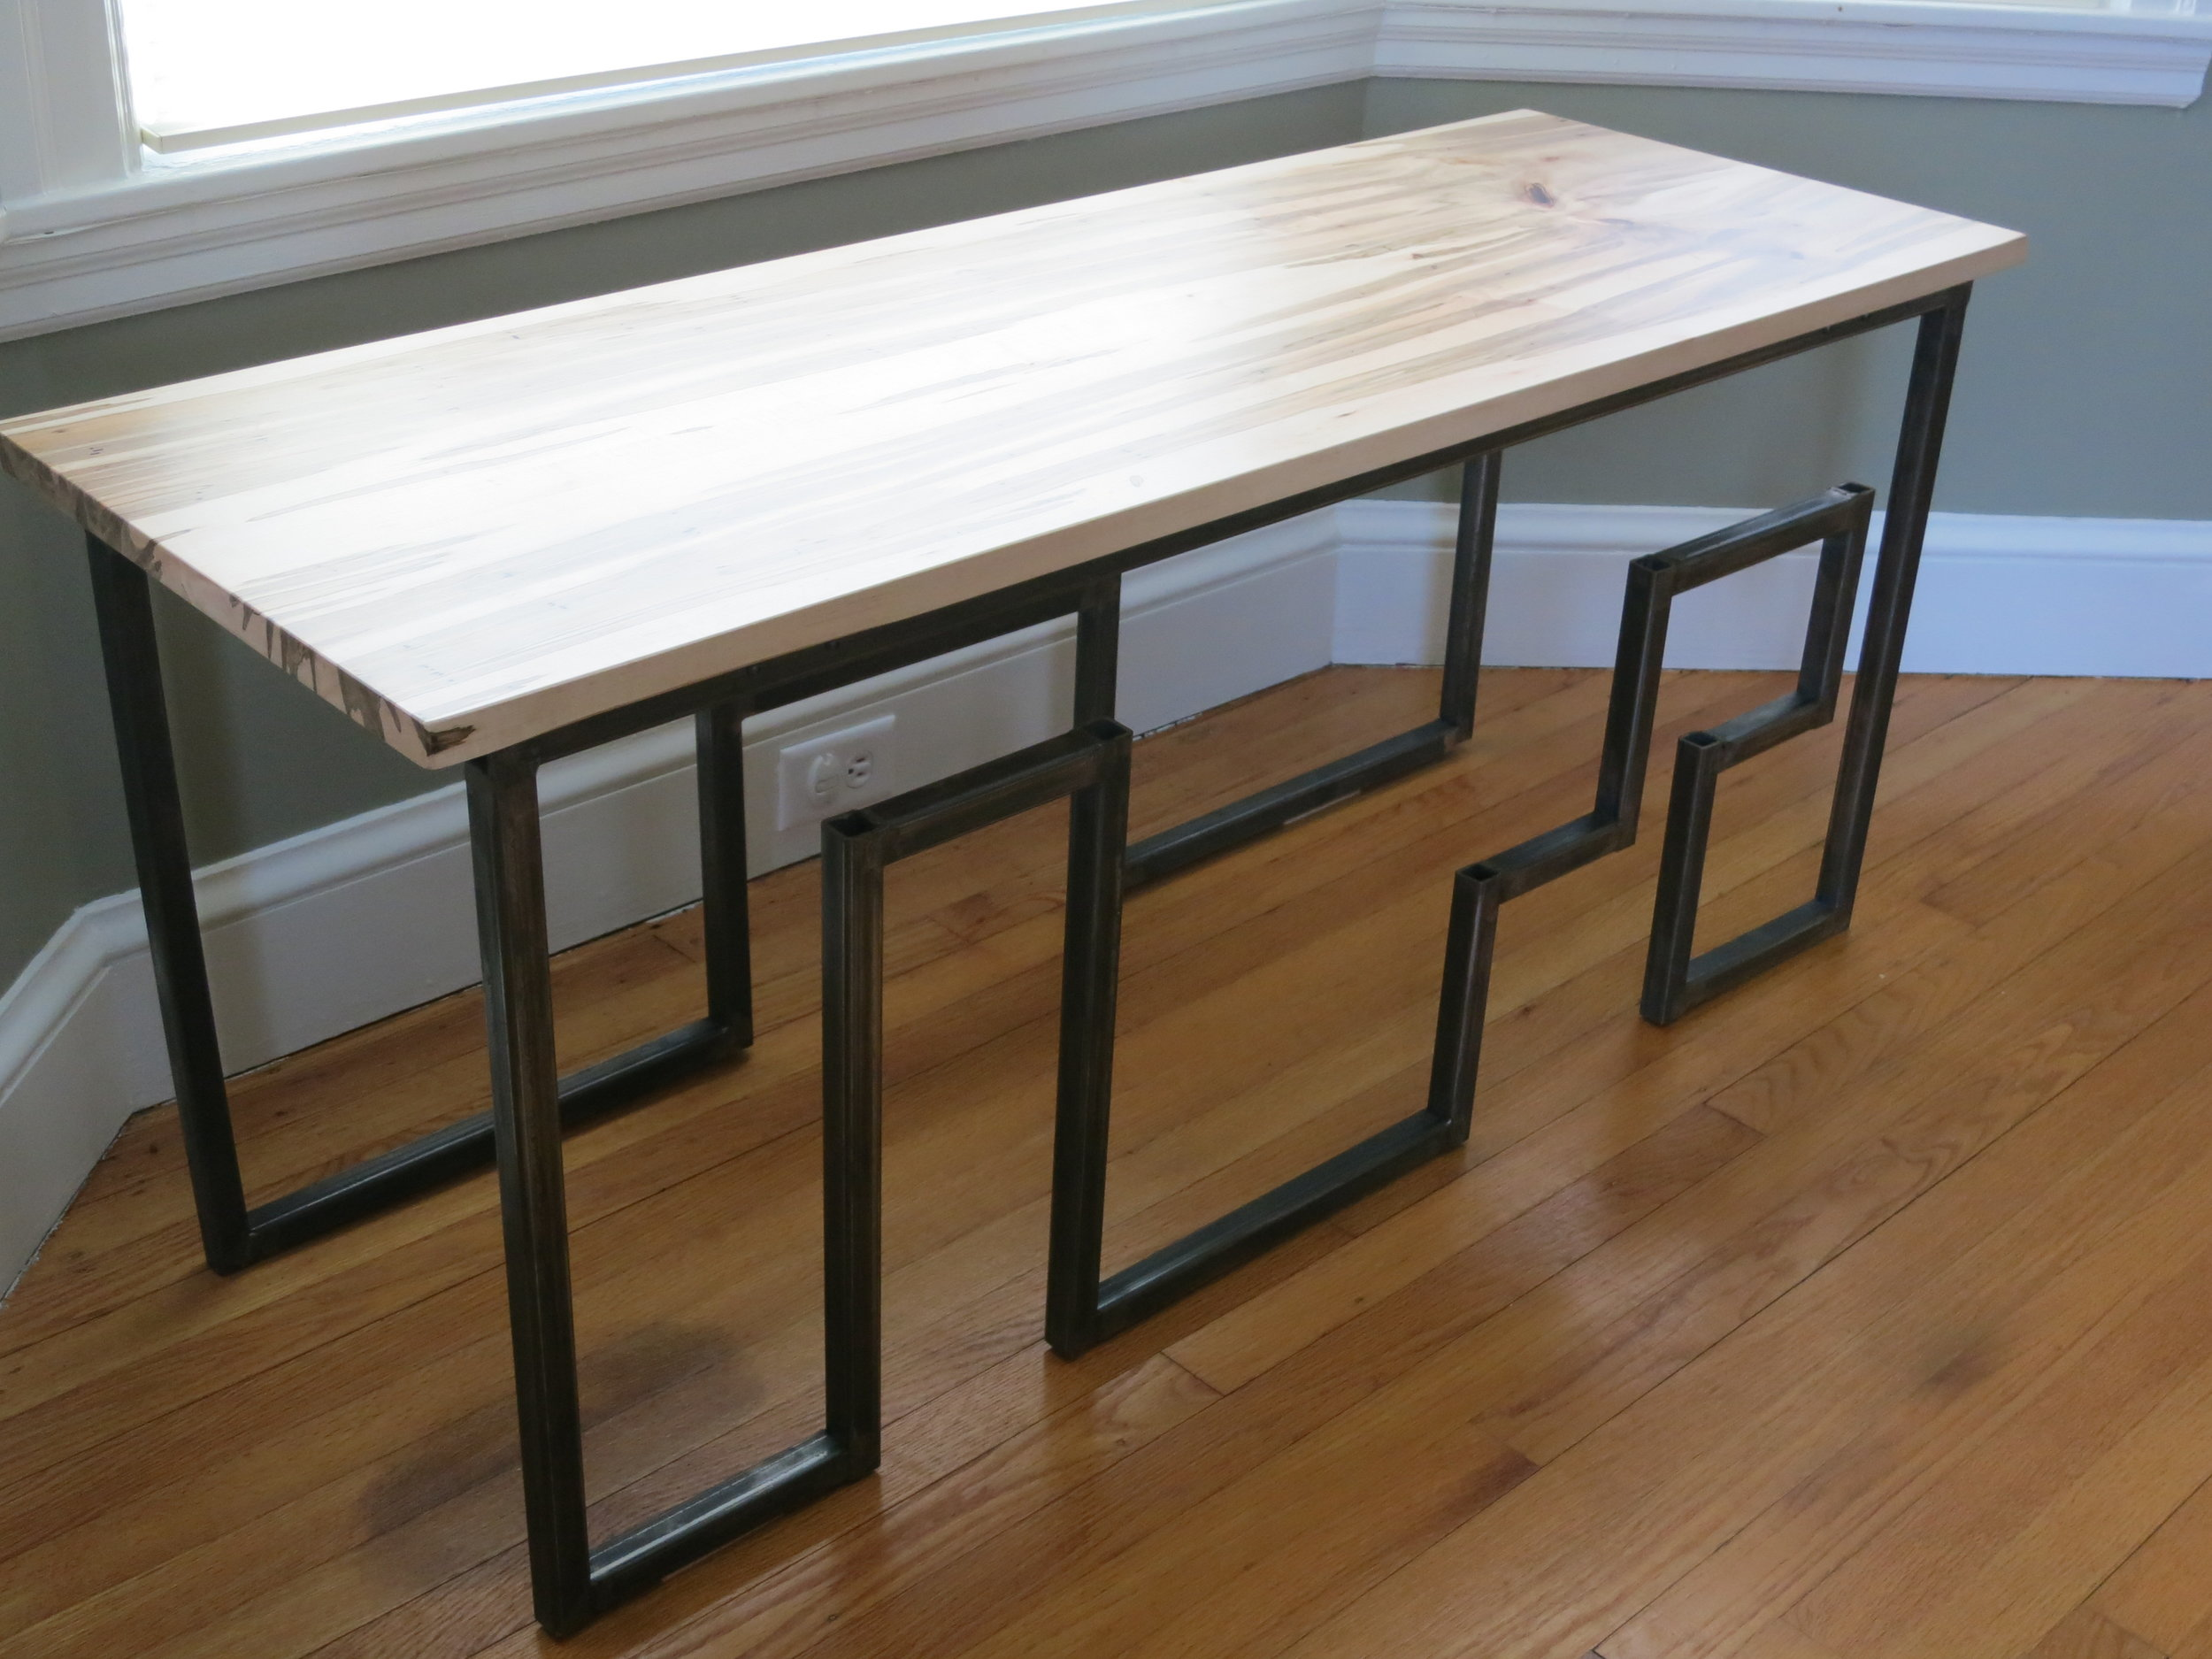 Geometric Table, 2014